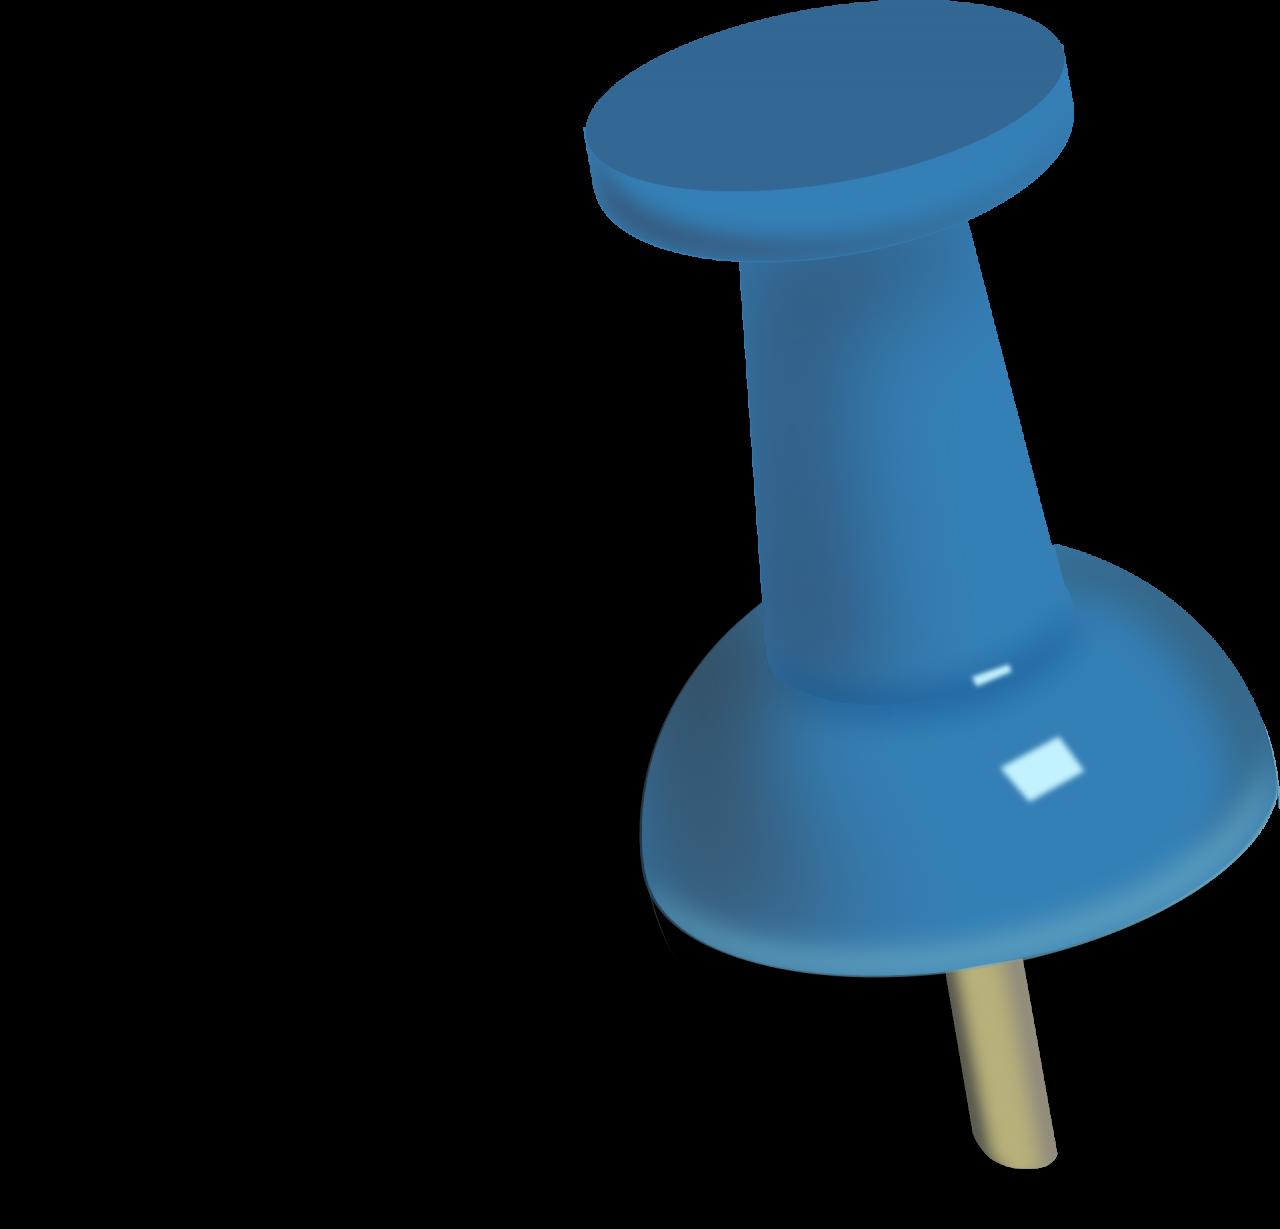 Pin PNG Image